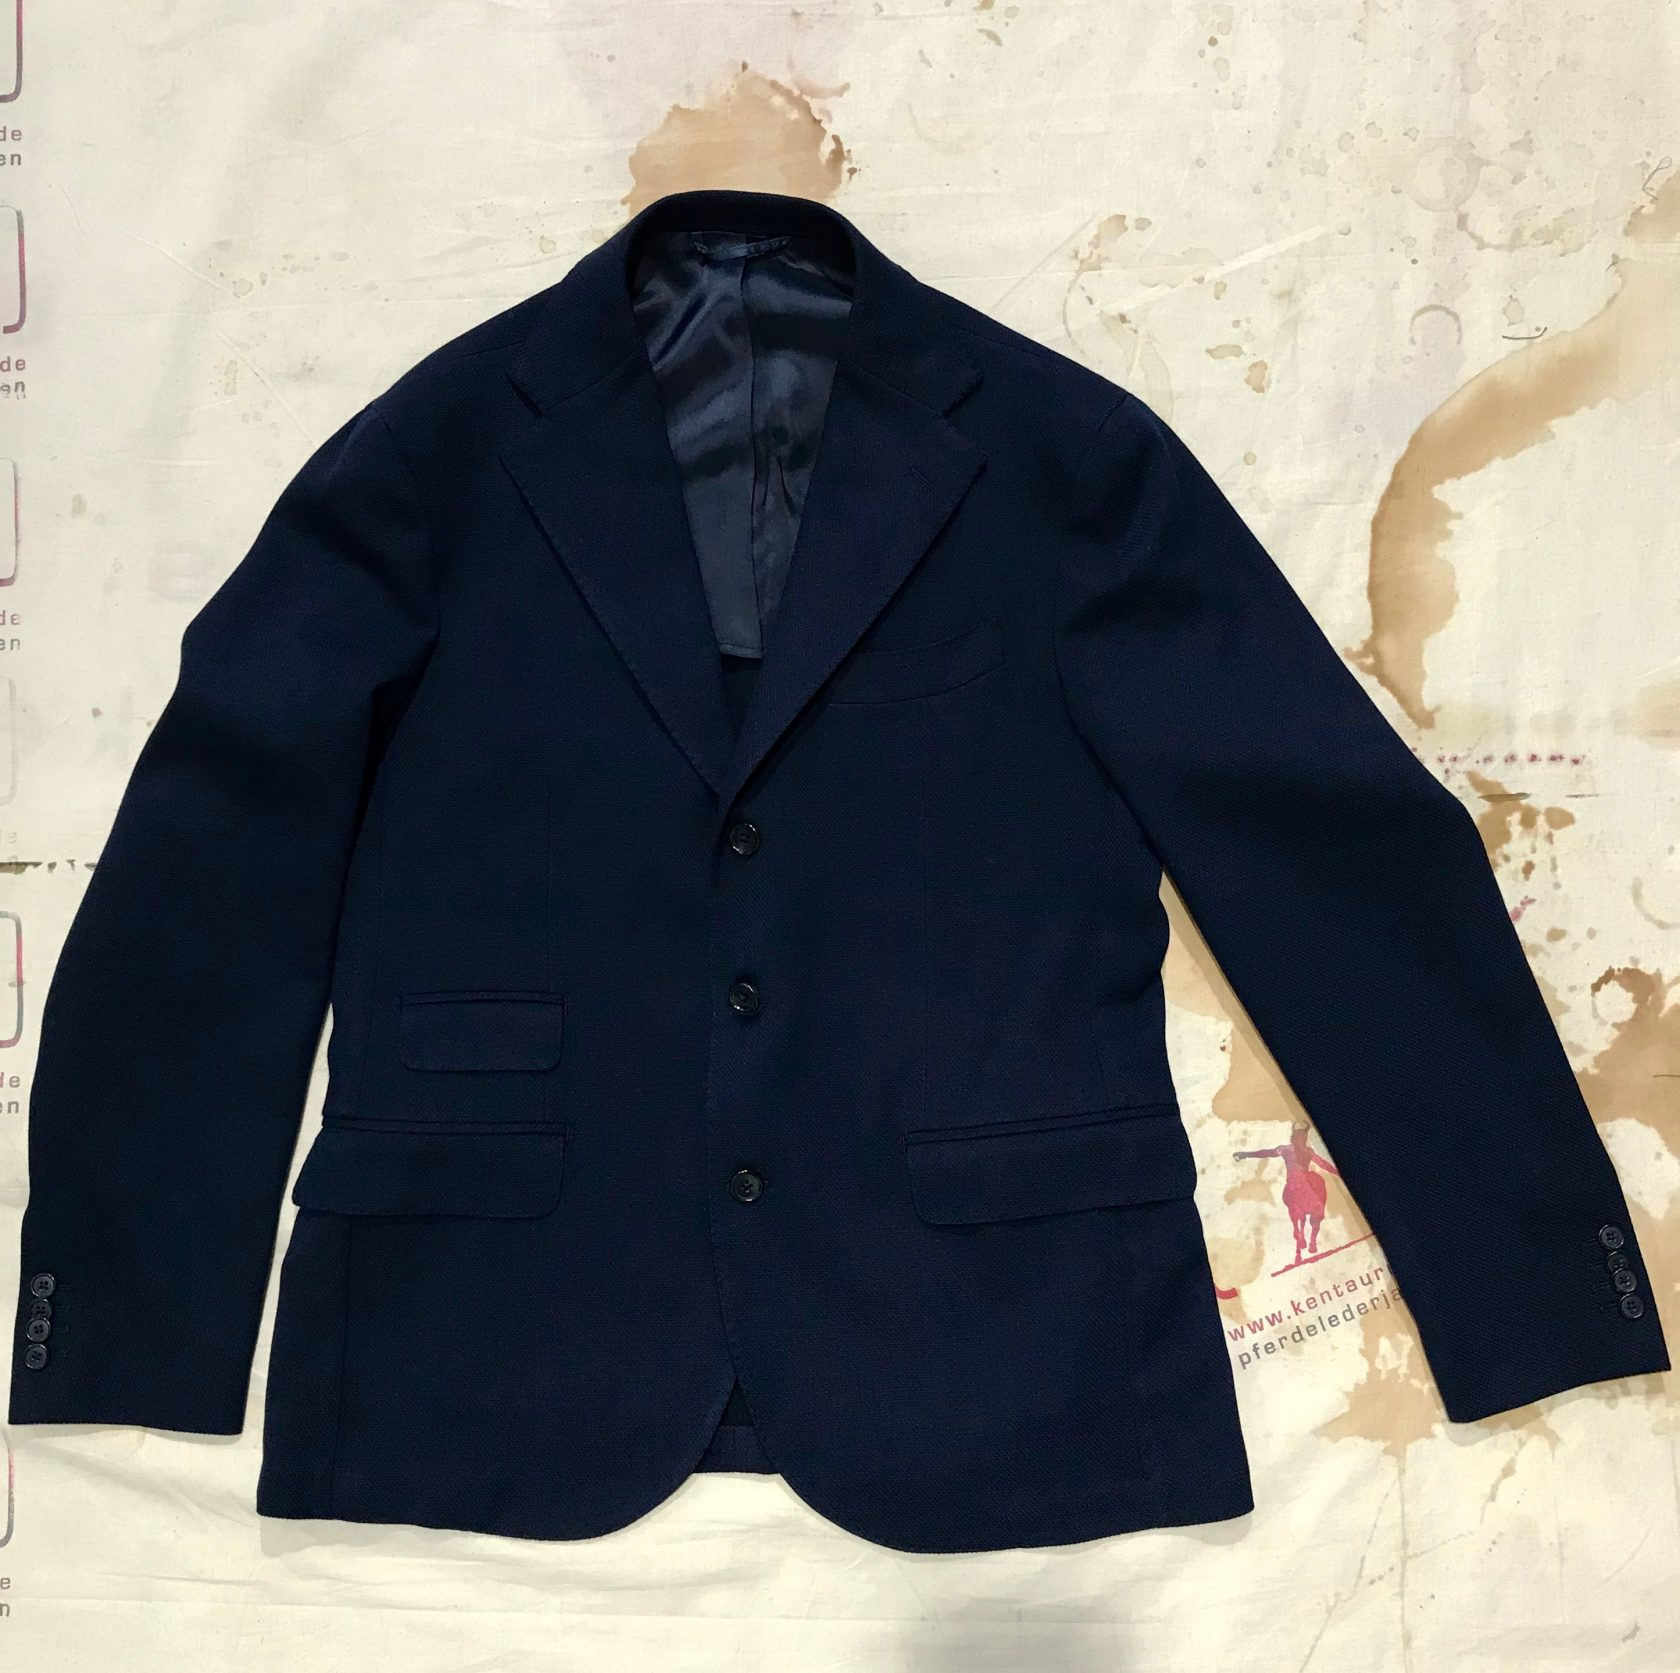 S.Piccolo blue summer jacket